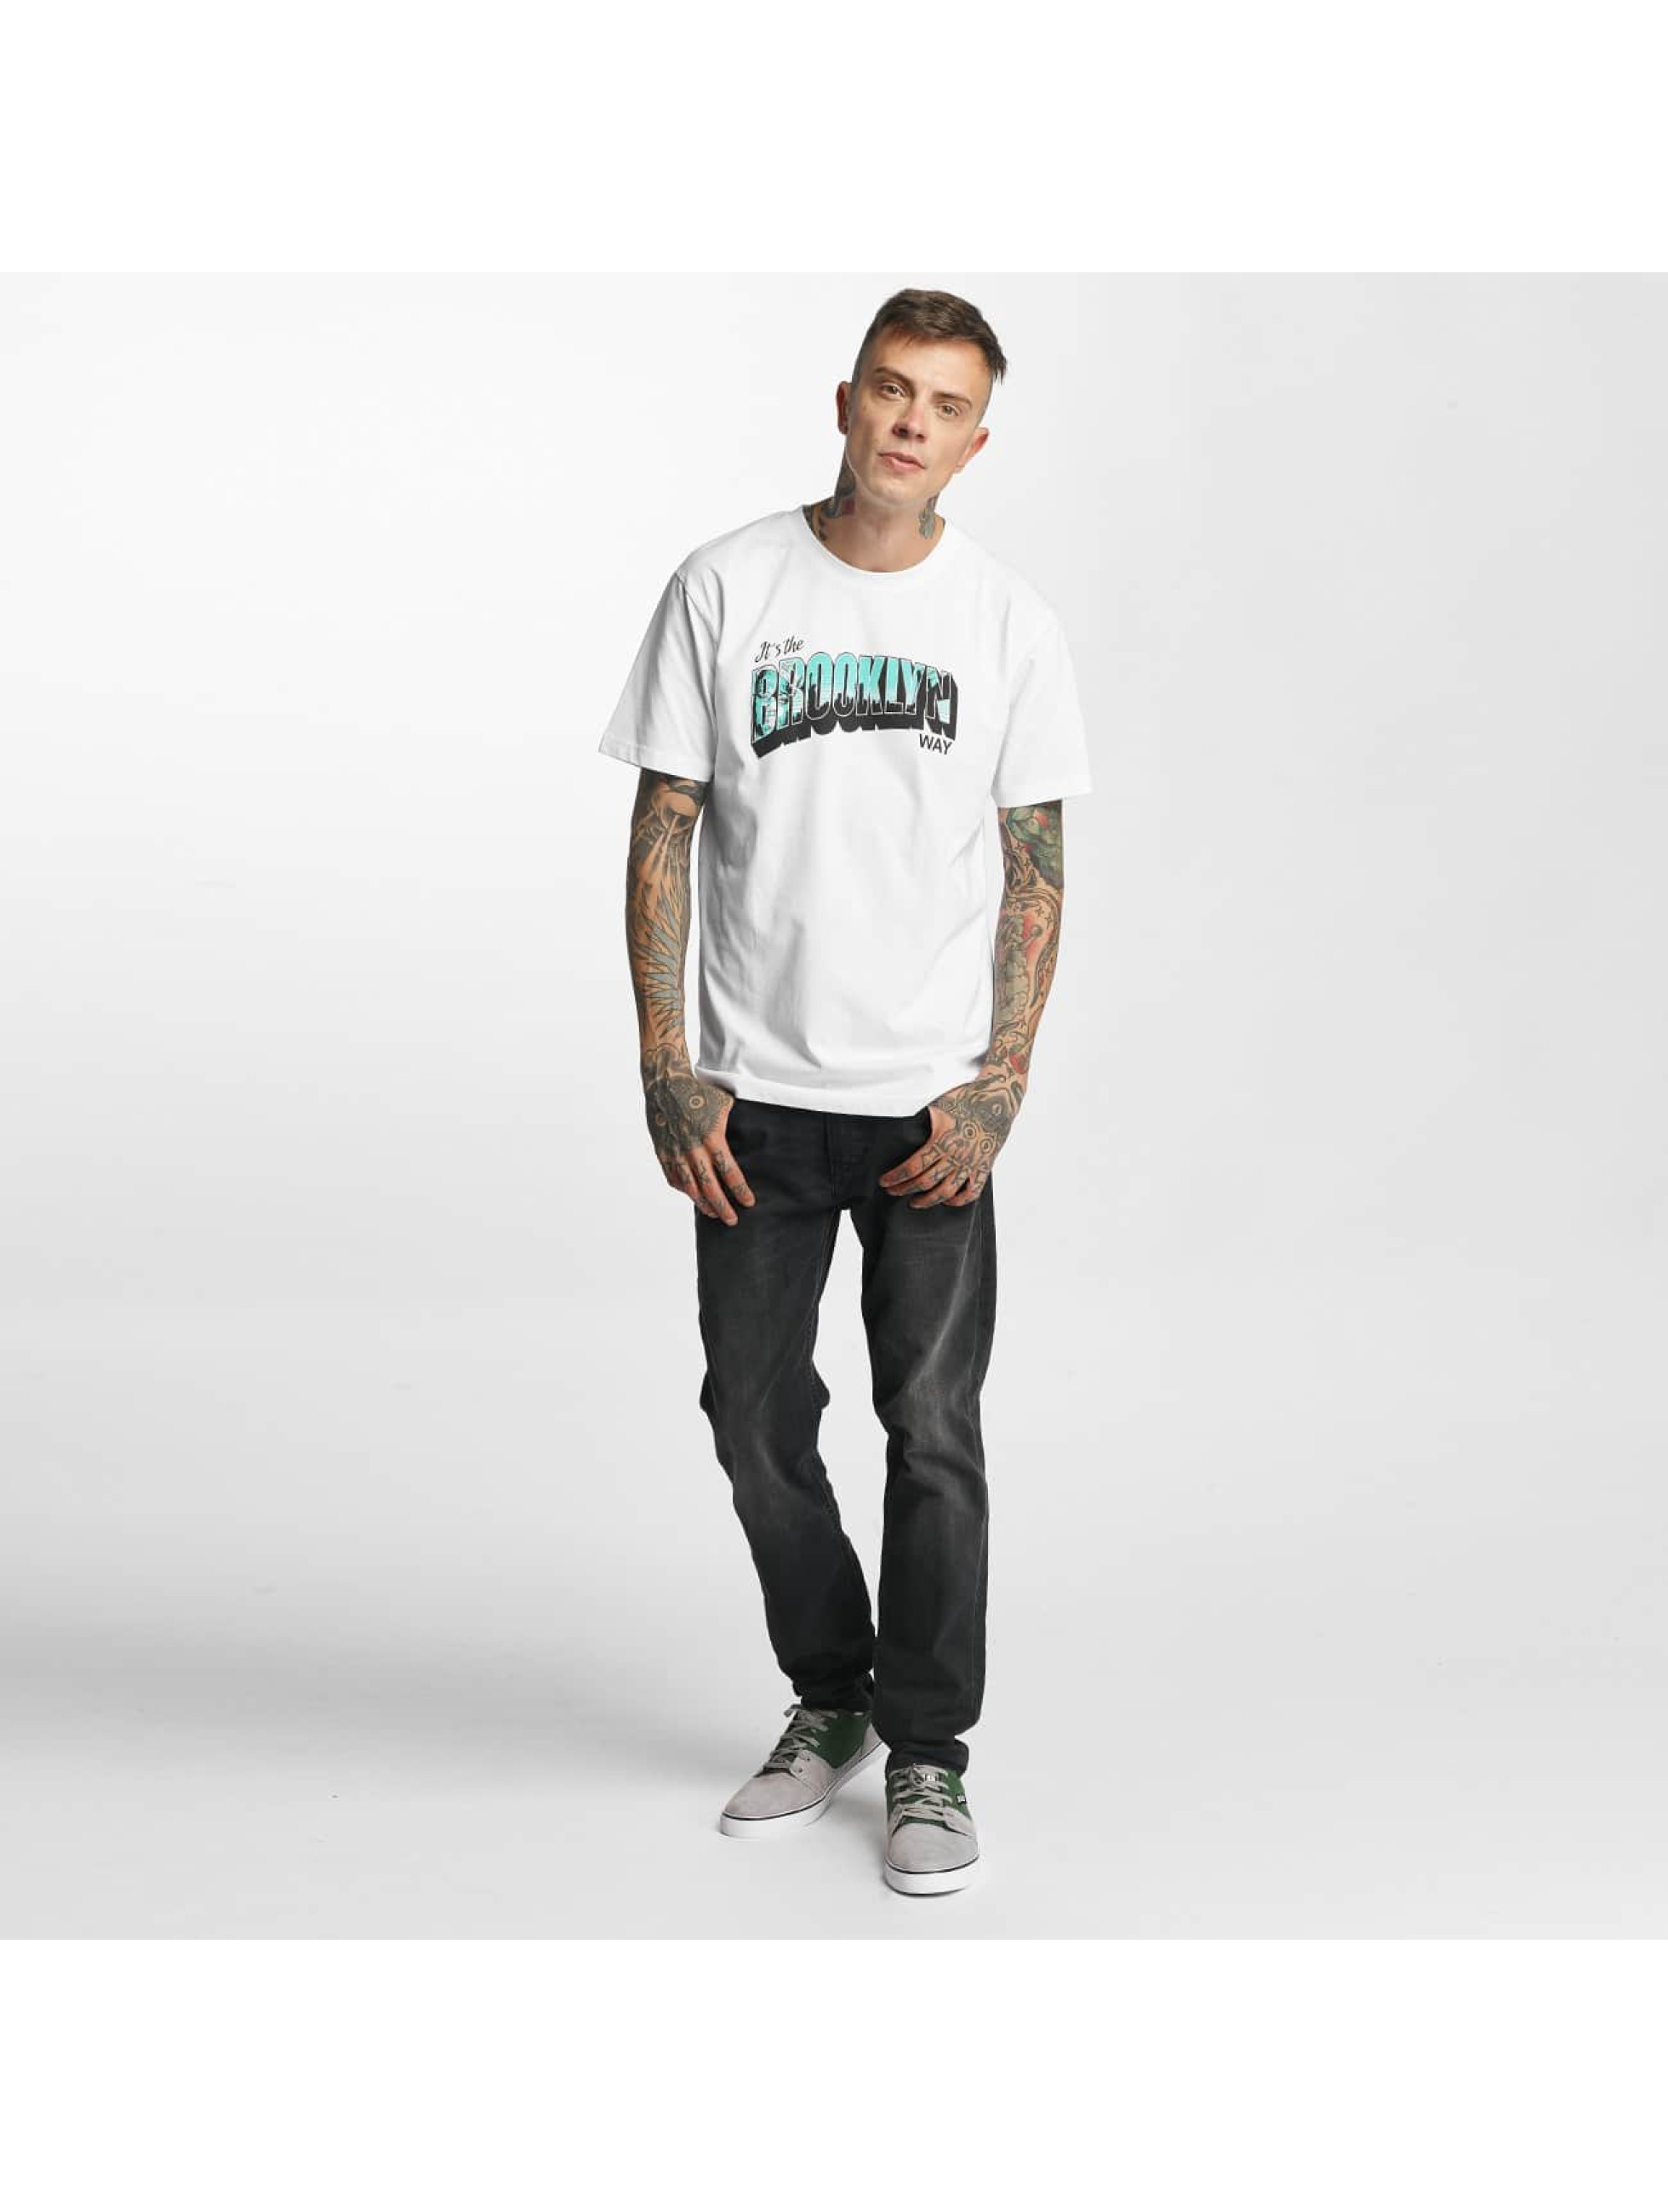 Mister Tee T-Shirt Brooklyn Way blanc